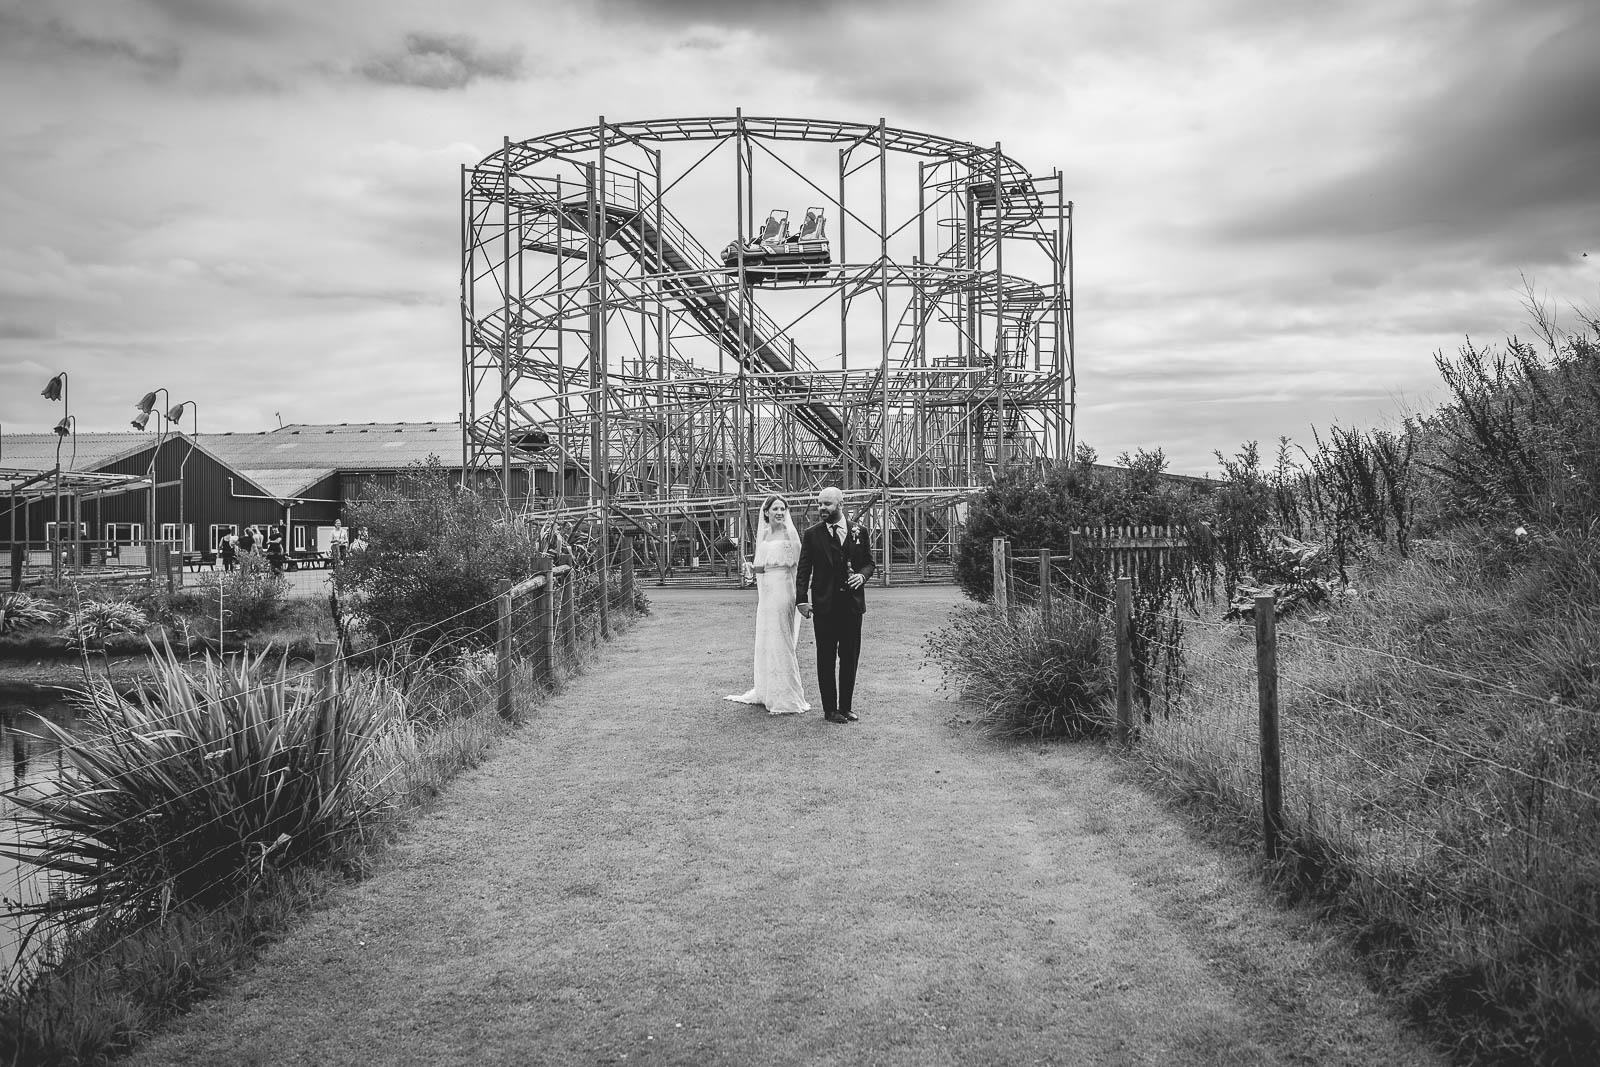 the old barn - clovelly - ugotthelove - wedding photography-8097.jpg